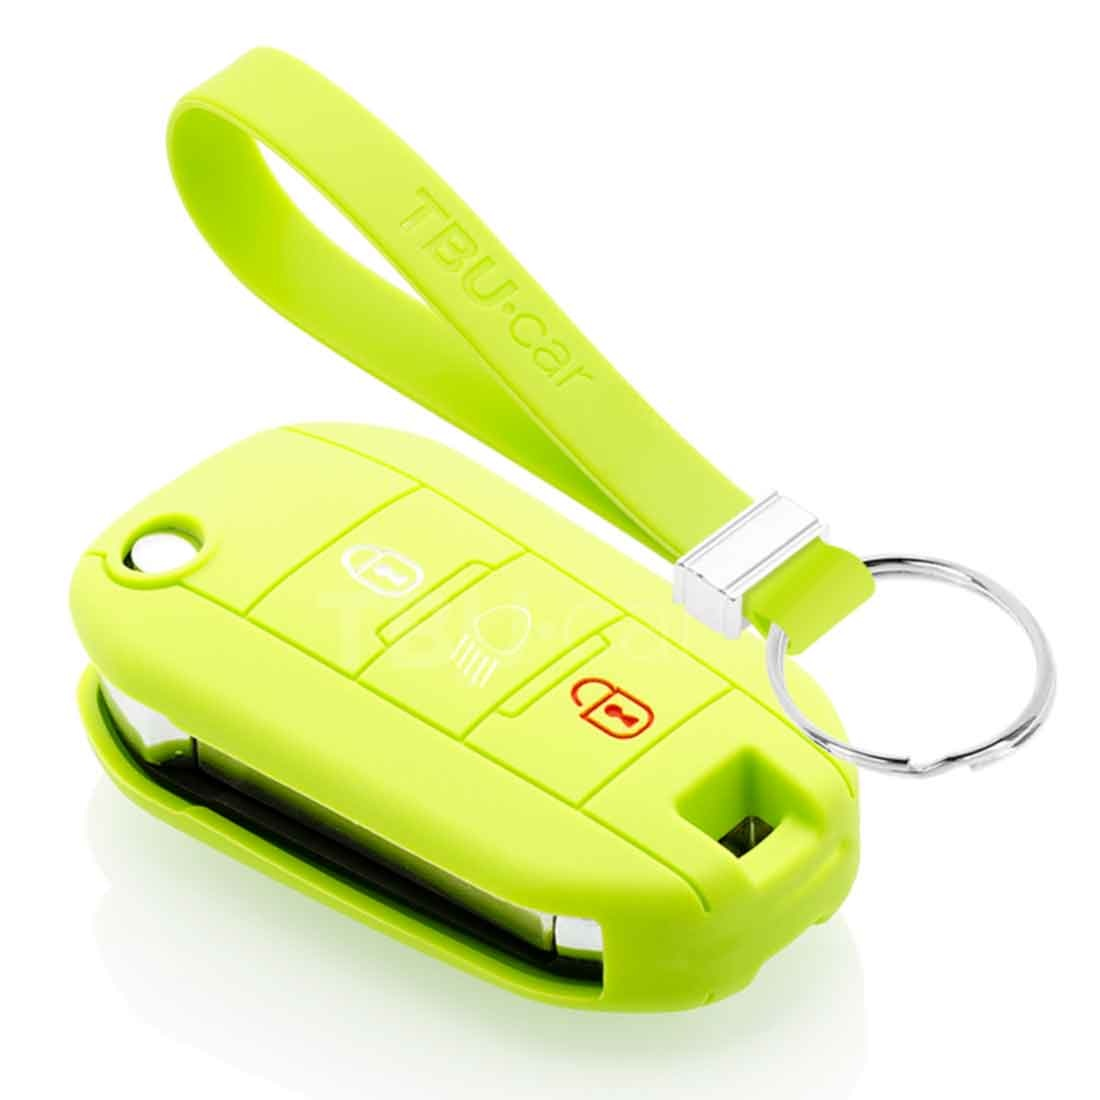 TBU car TBU car Autoschlüssel Hülle kompatibel mit Peugeot 3 Tasten (Licht Taste) - Schutzhülle aus Silikon - Auto Schlüsselhülle Cover in Lindgrün